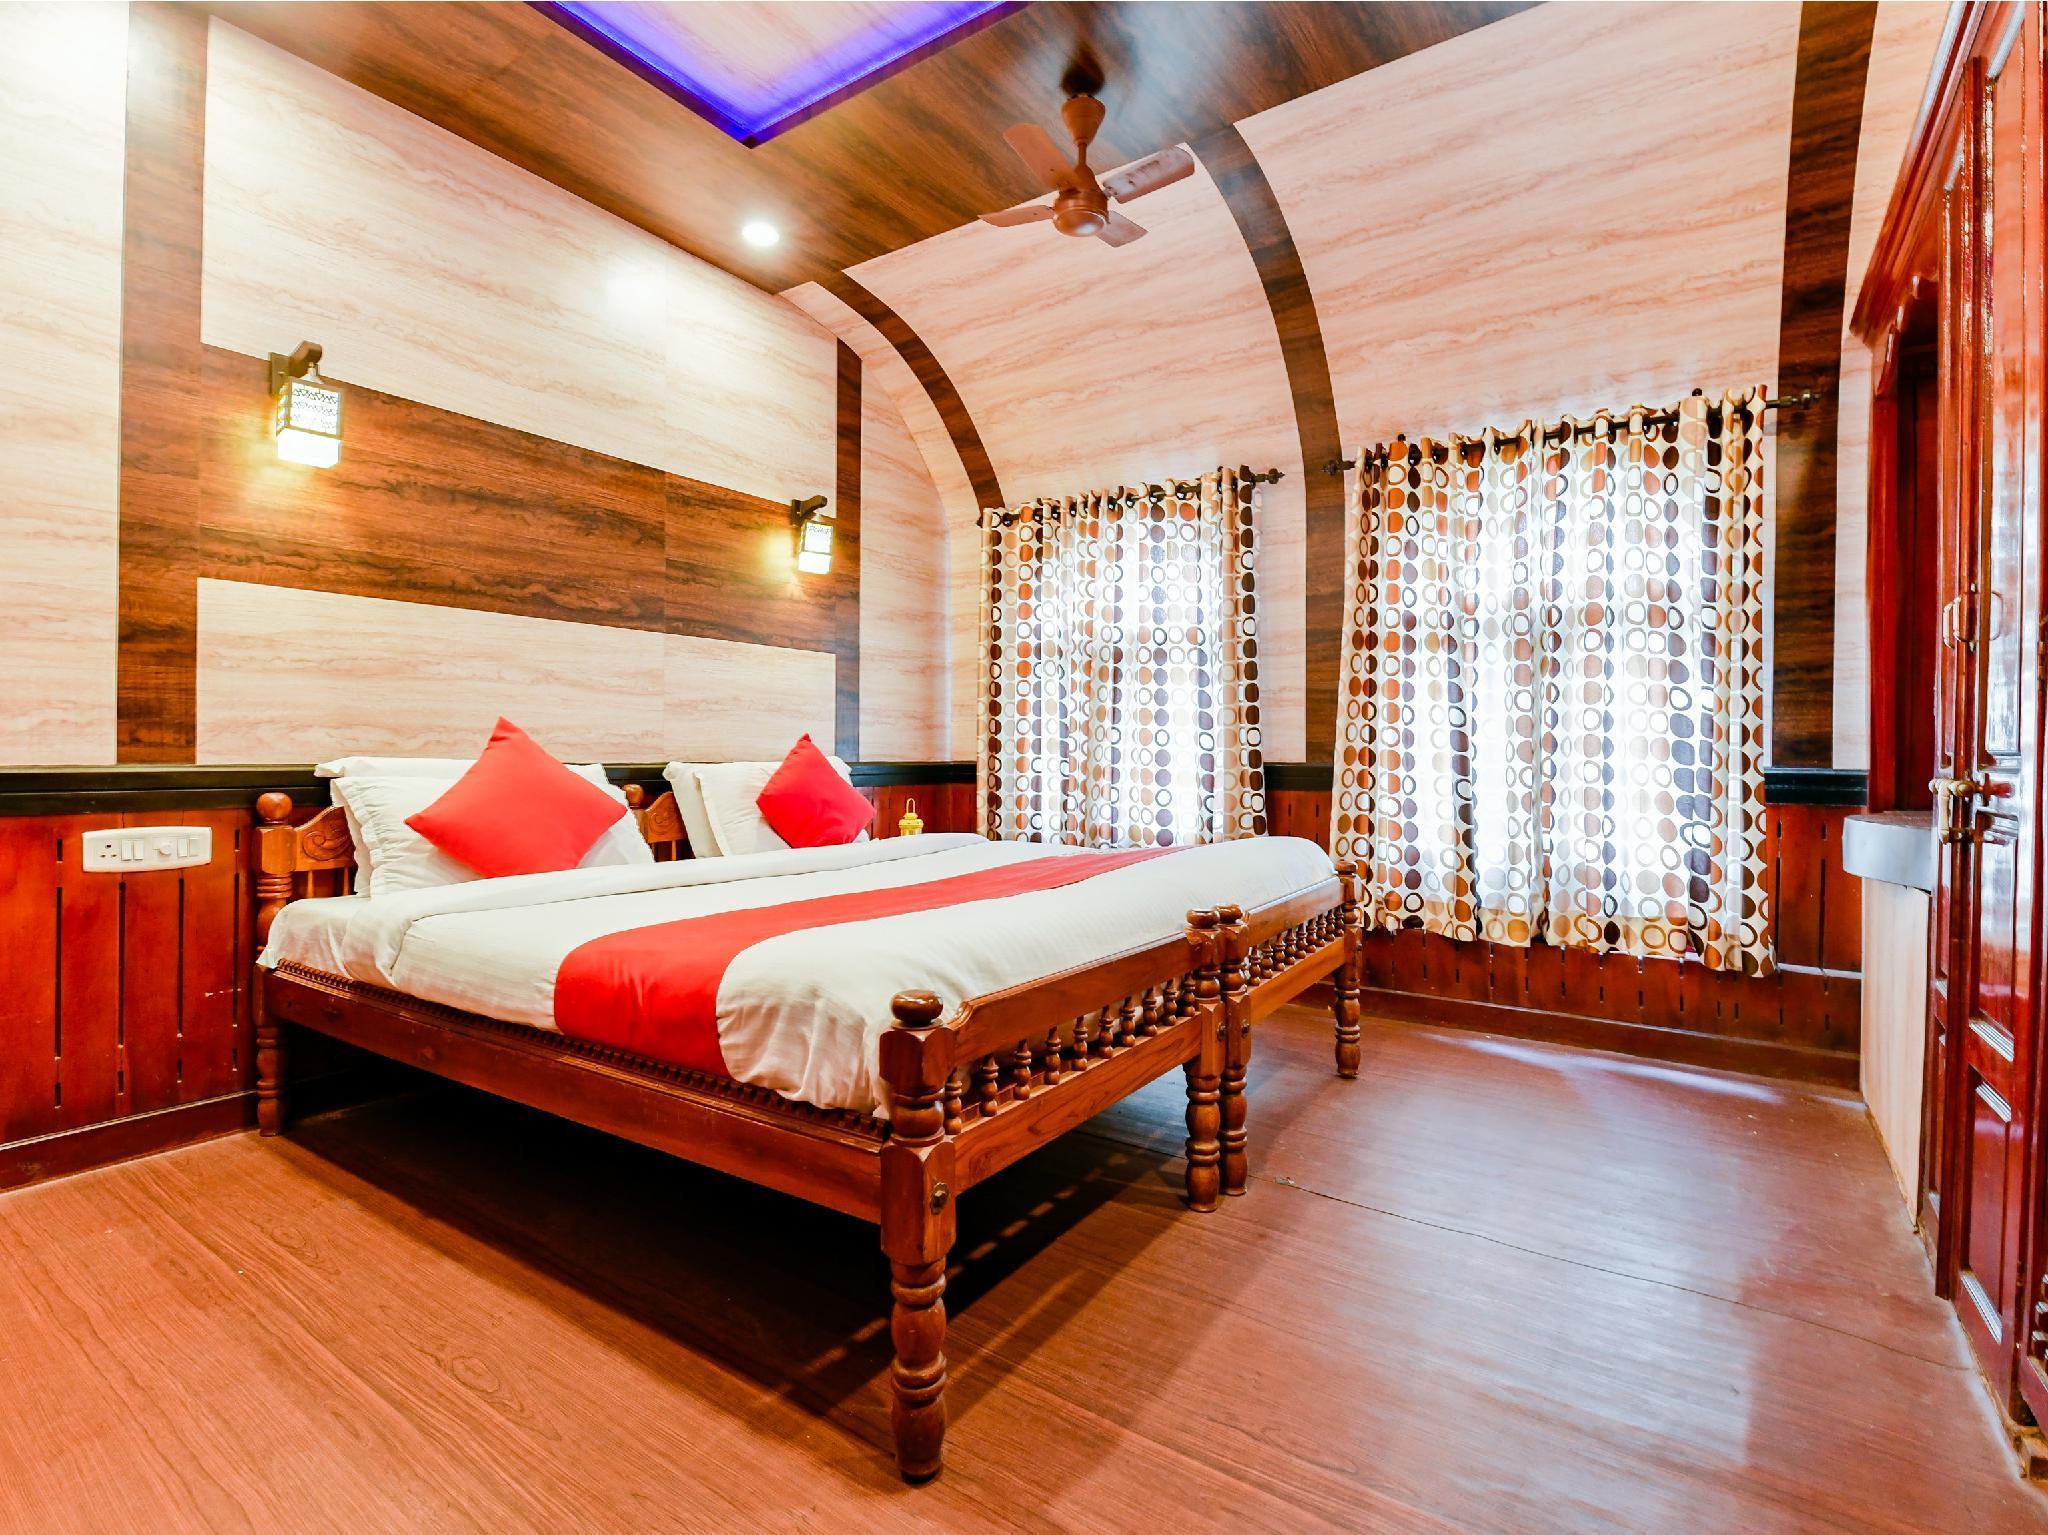 OYO 24271 Houseboat My Trip 2bhk, Alappuzha